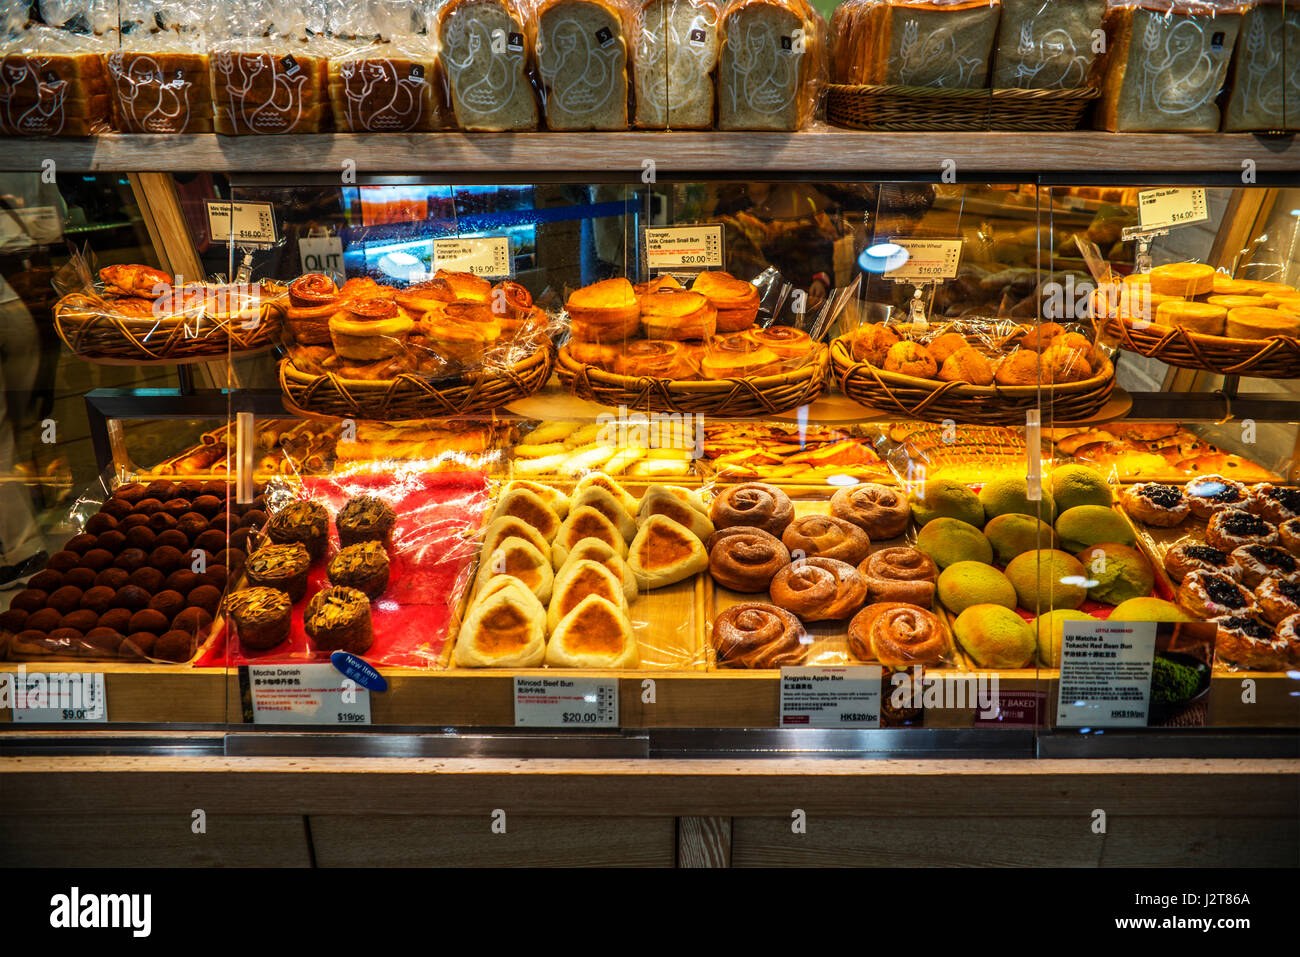 Bakery Counter, City Super, Times Square, Hong Kong - Stock Image